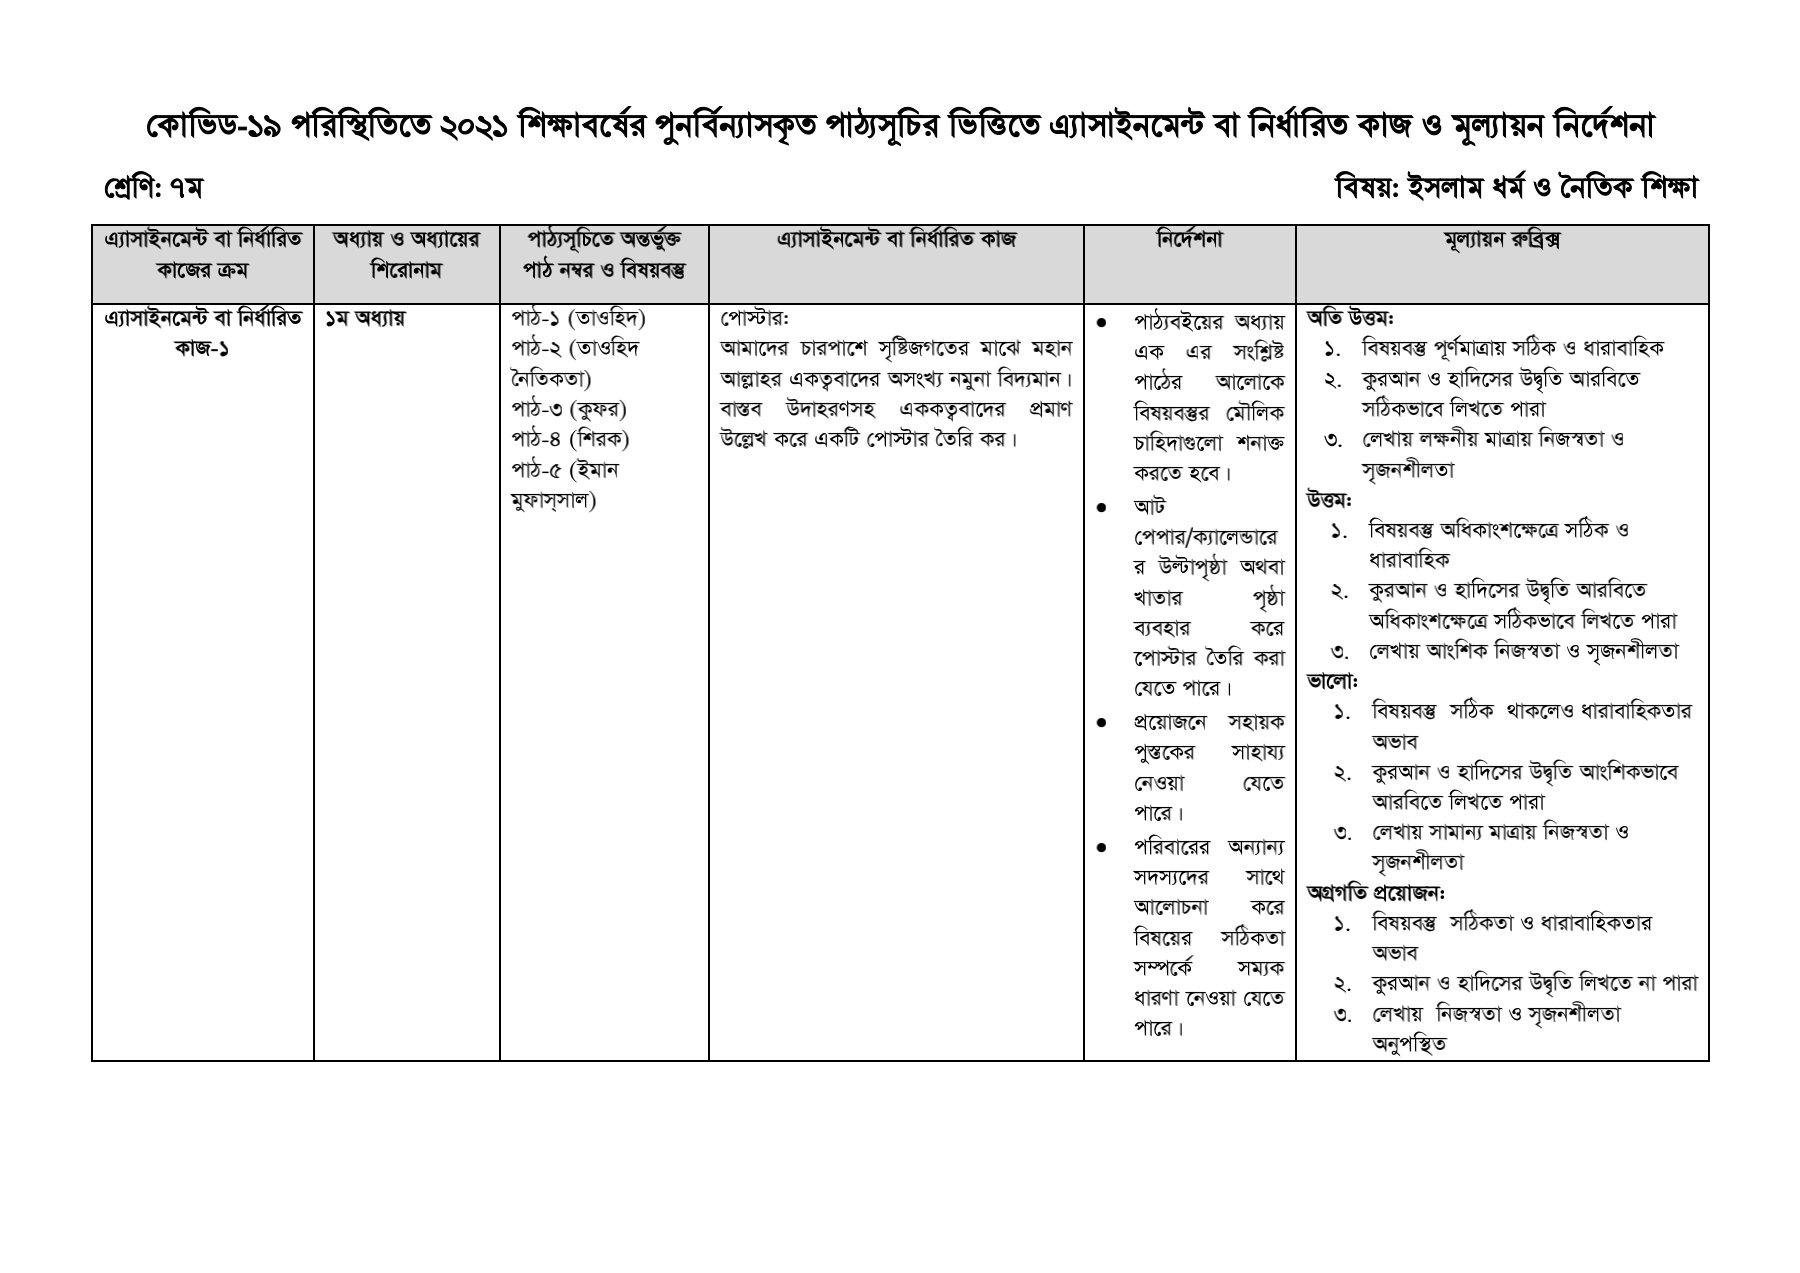 Class 7 1st Assignment Solution 2021   | ৭ম/সপ্তম শ্রেণীর এসাইনমেন্ট উত্তর/সমাধান ২০২১